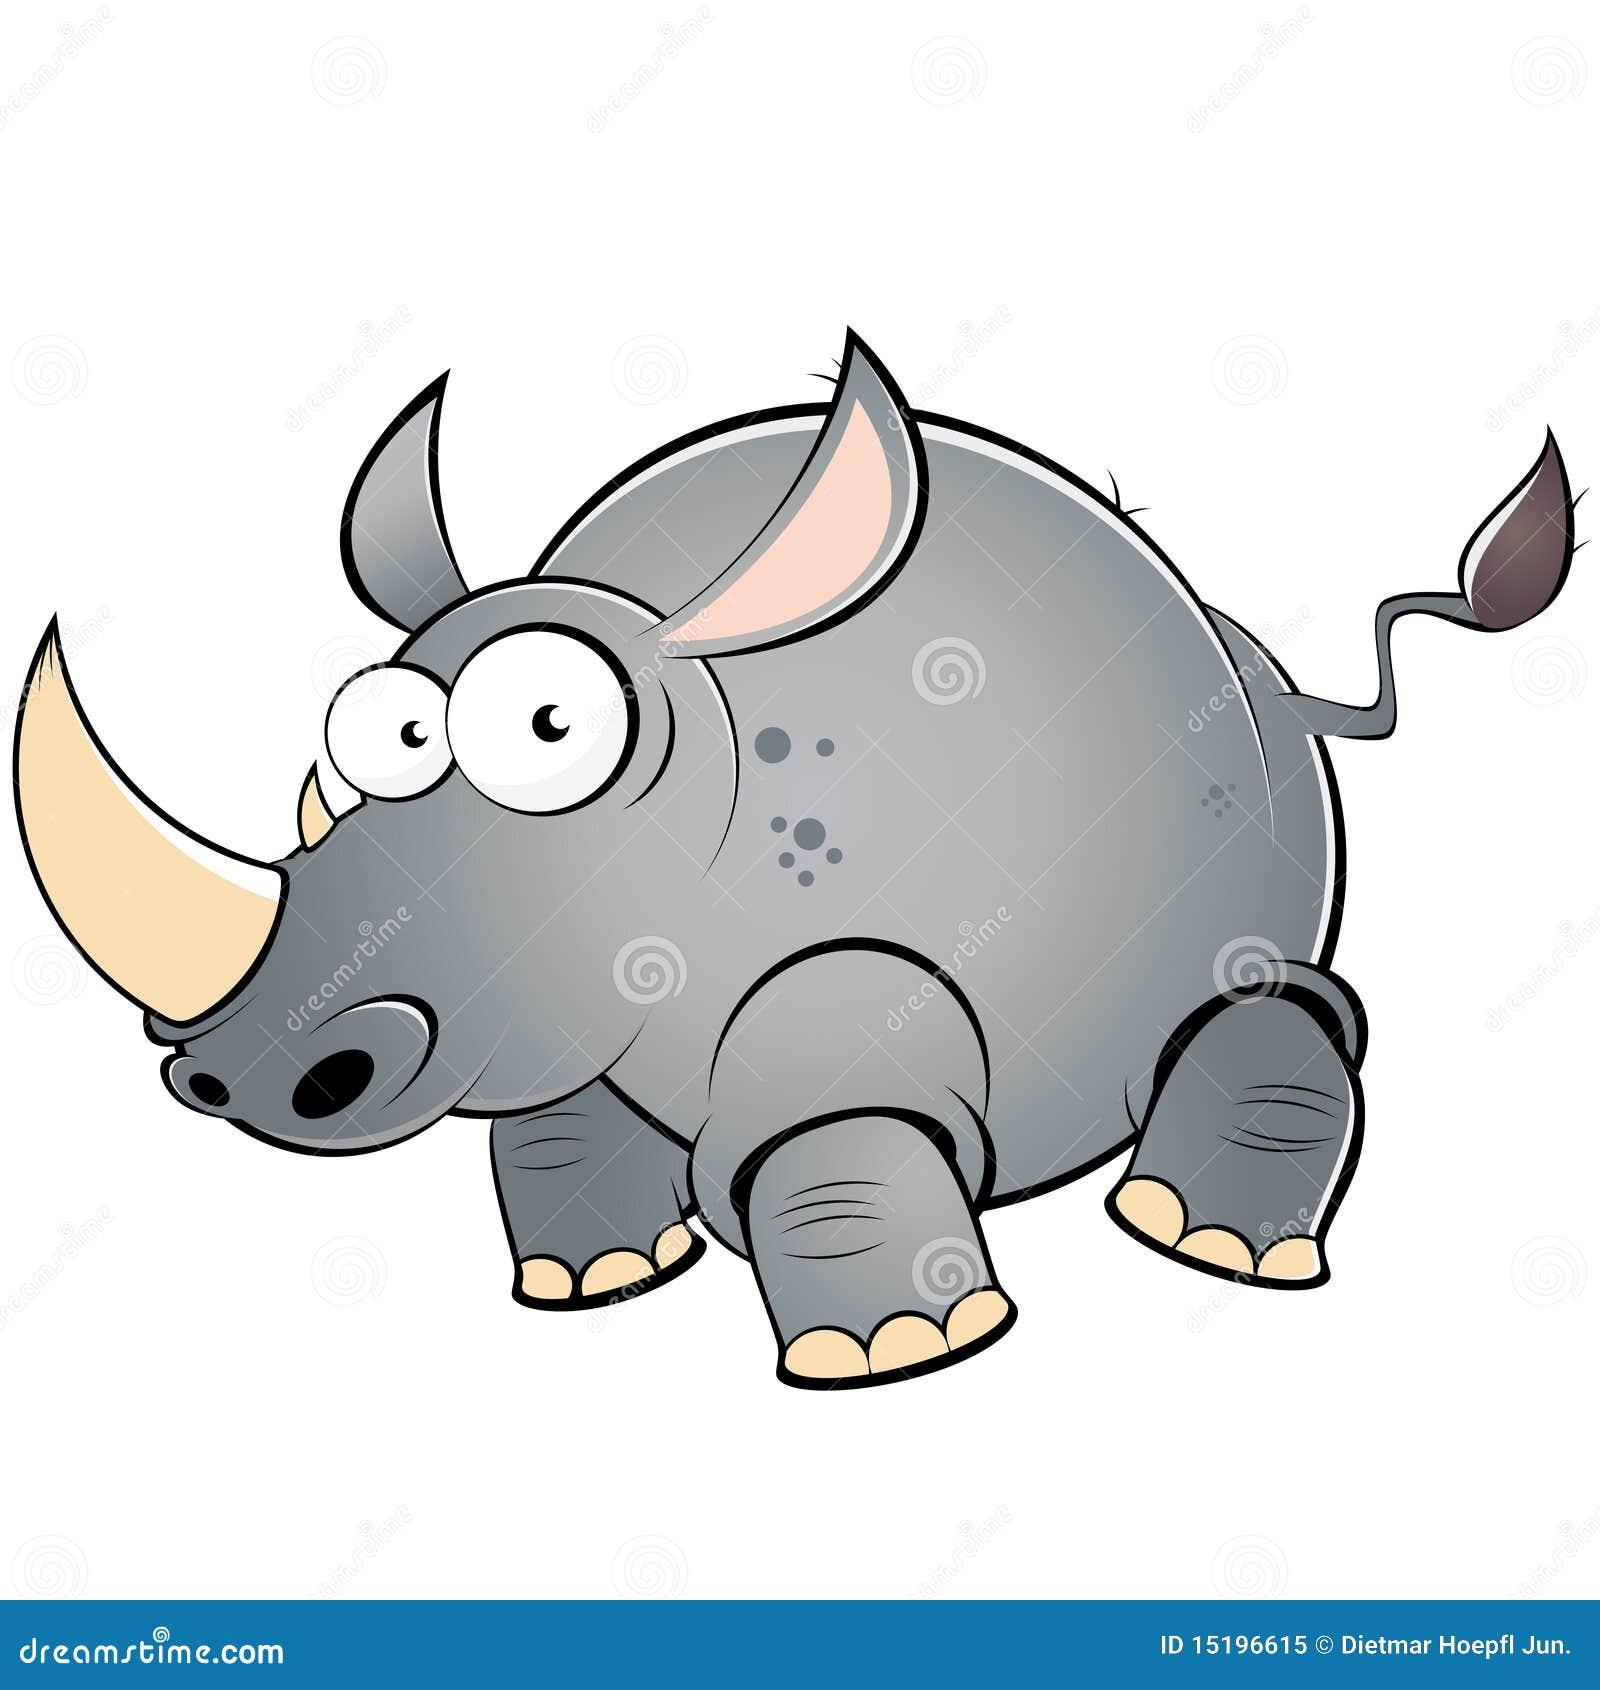 Gros rhinoc ros de dessin anim photo libre de droits - Rhinoceros dessin ...